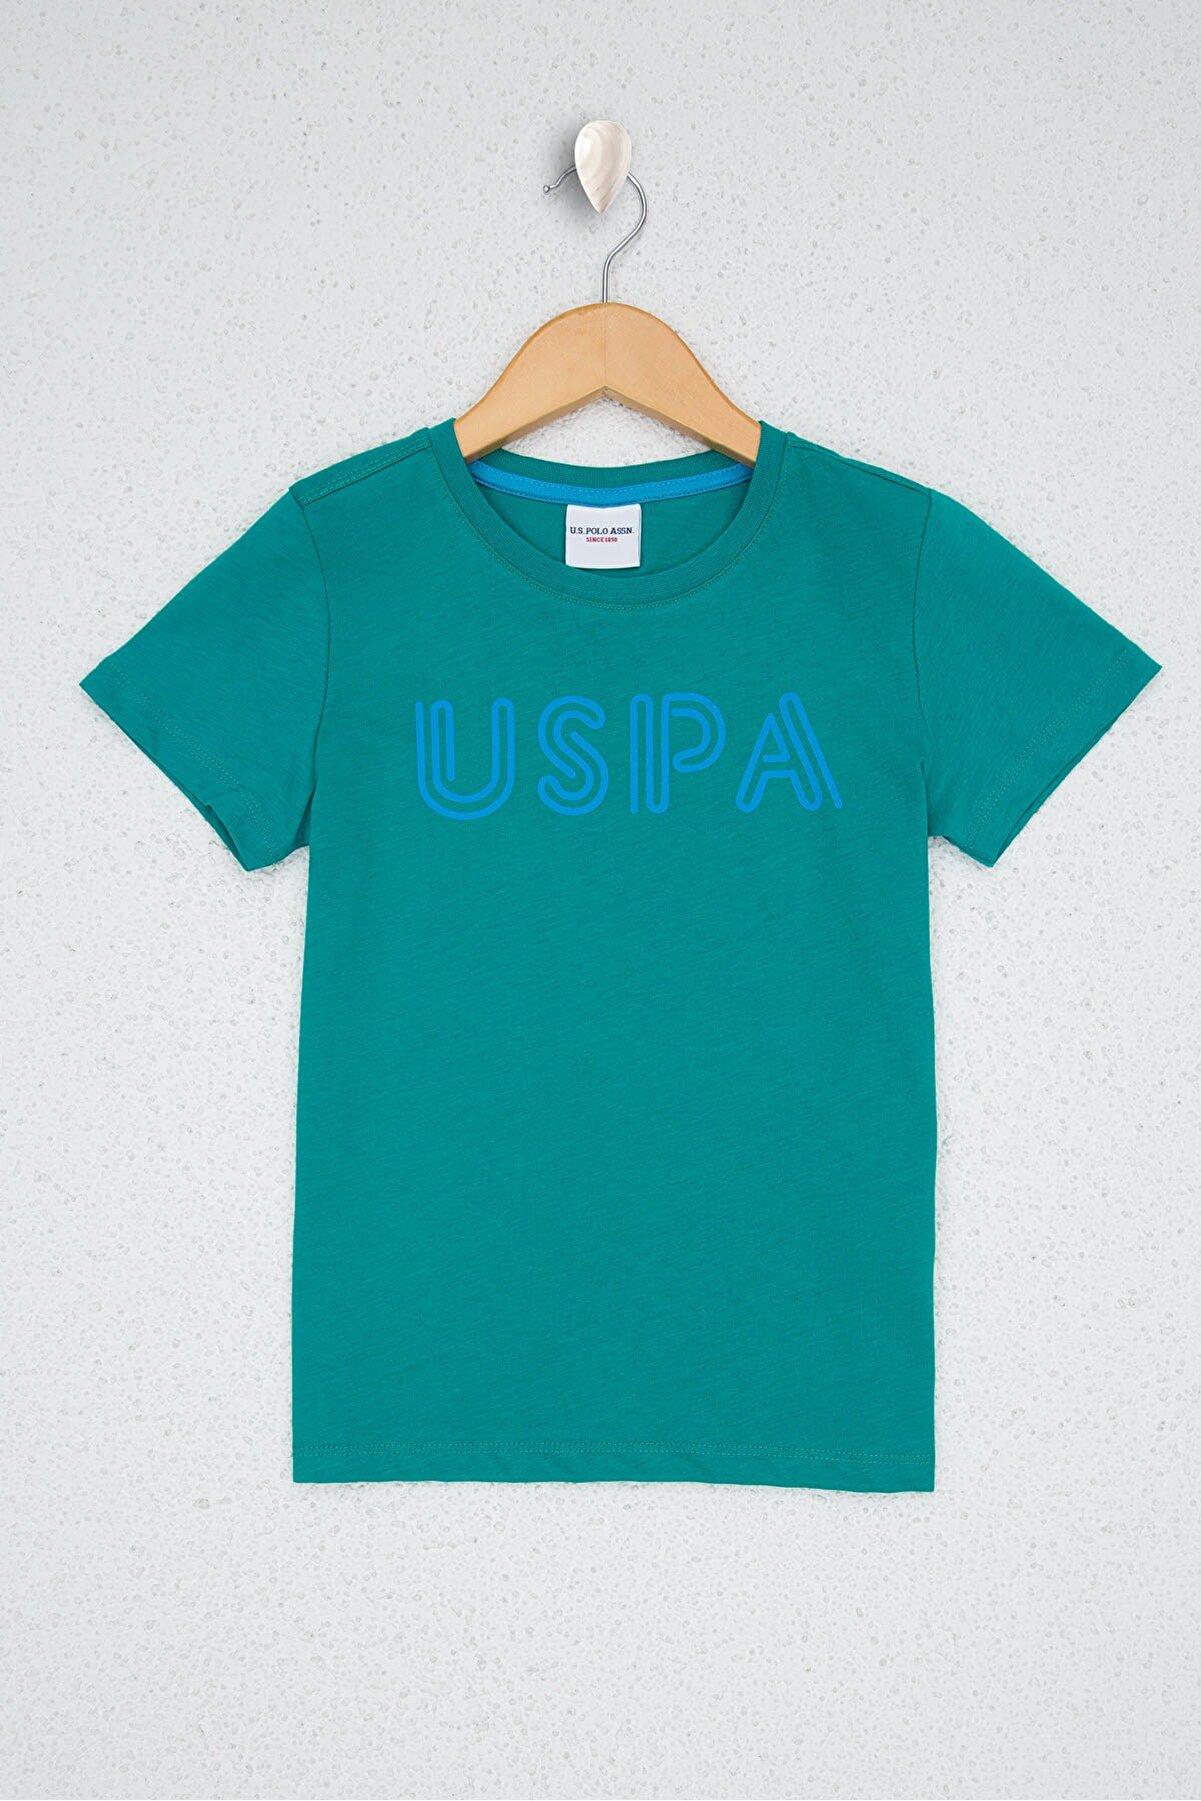 US Polo Assn Yesıl Erkek Çocuk T-Shirt